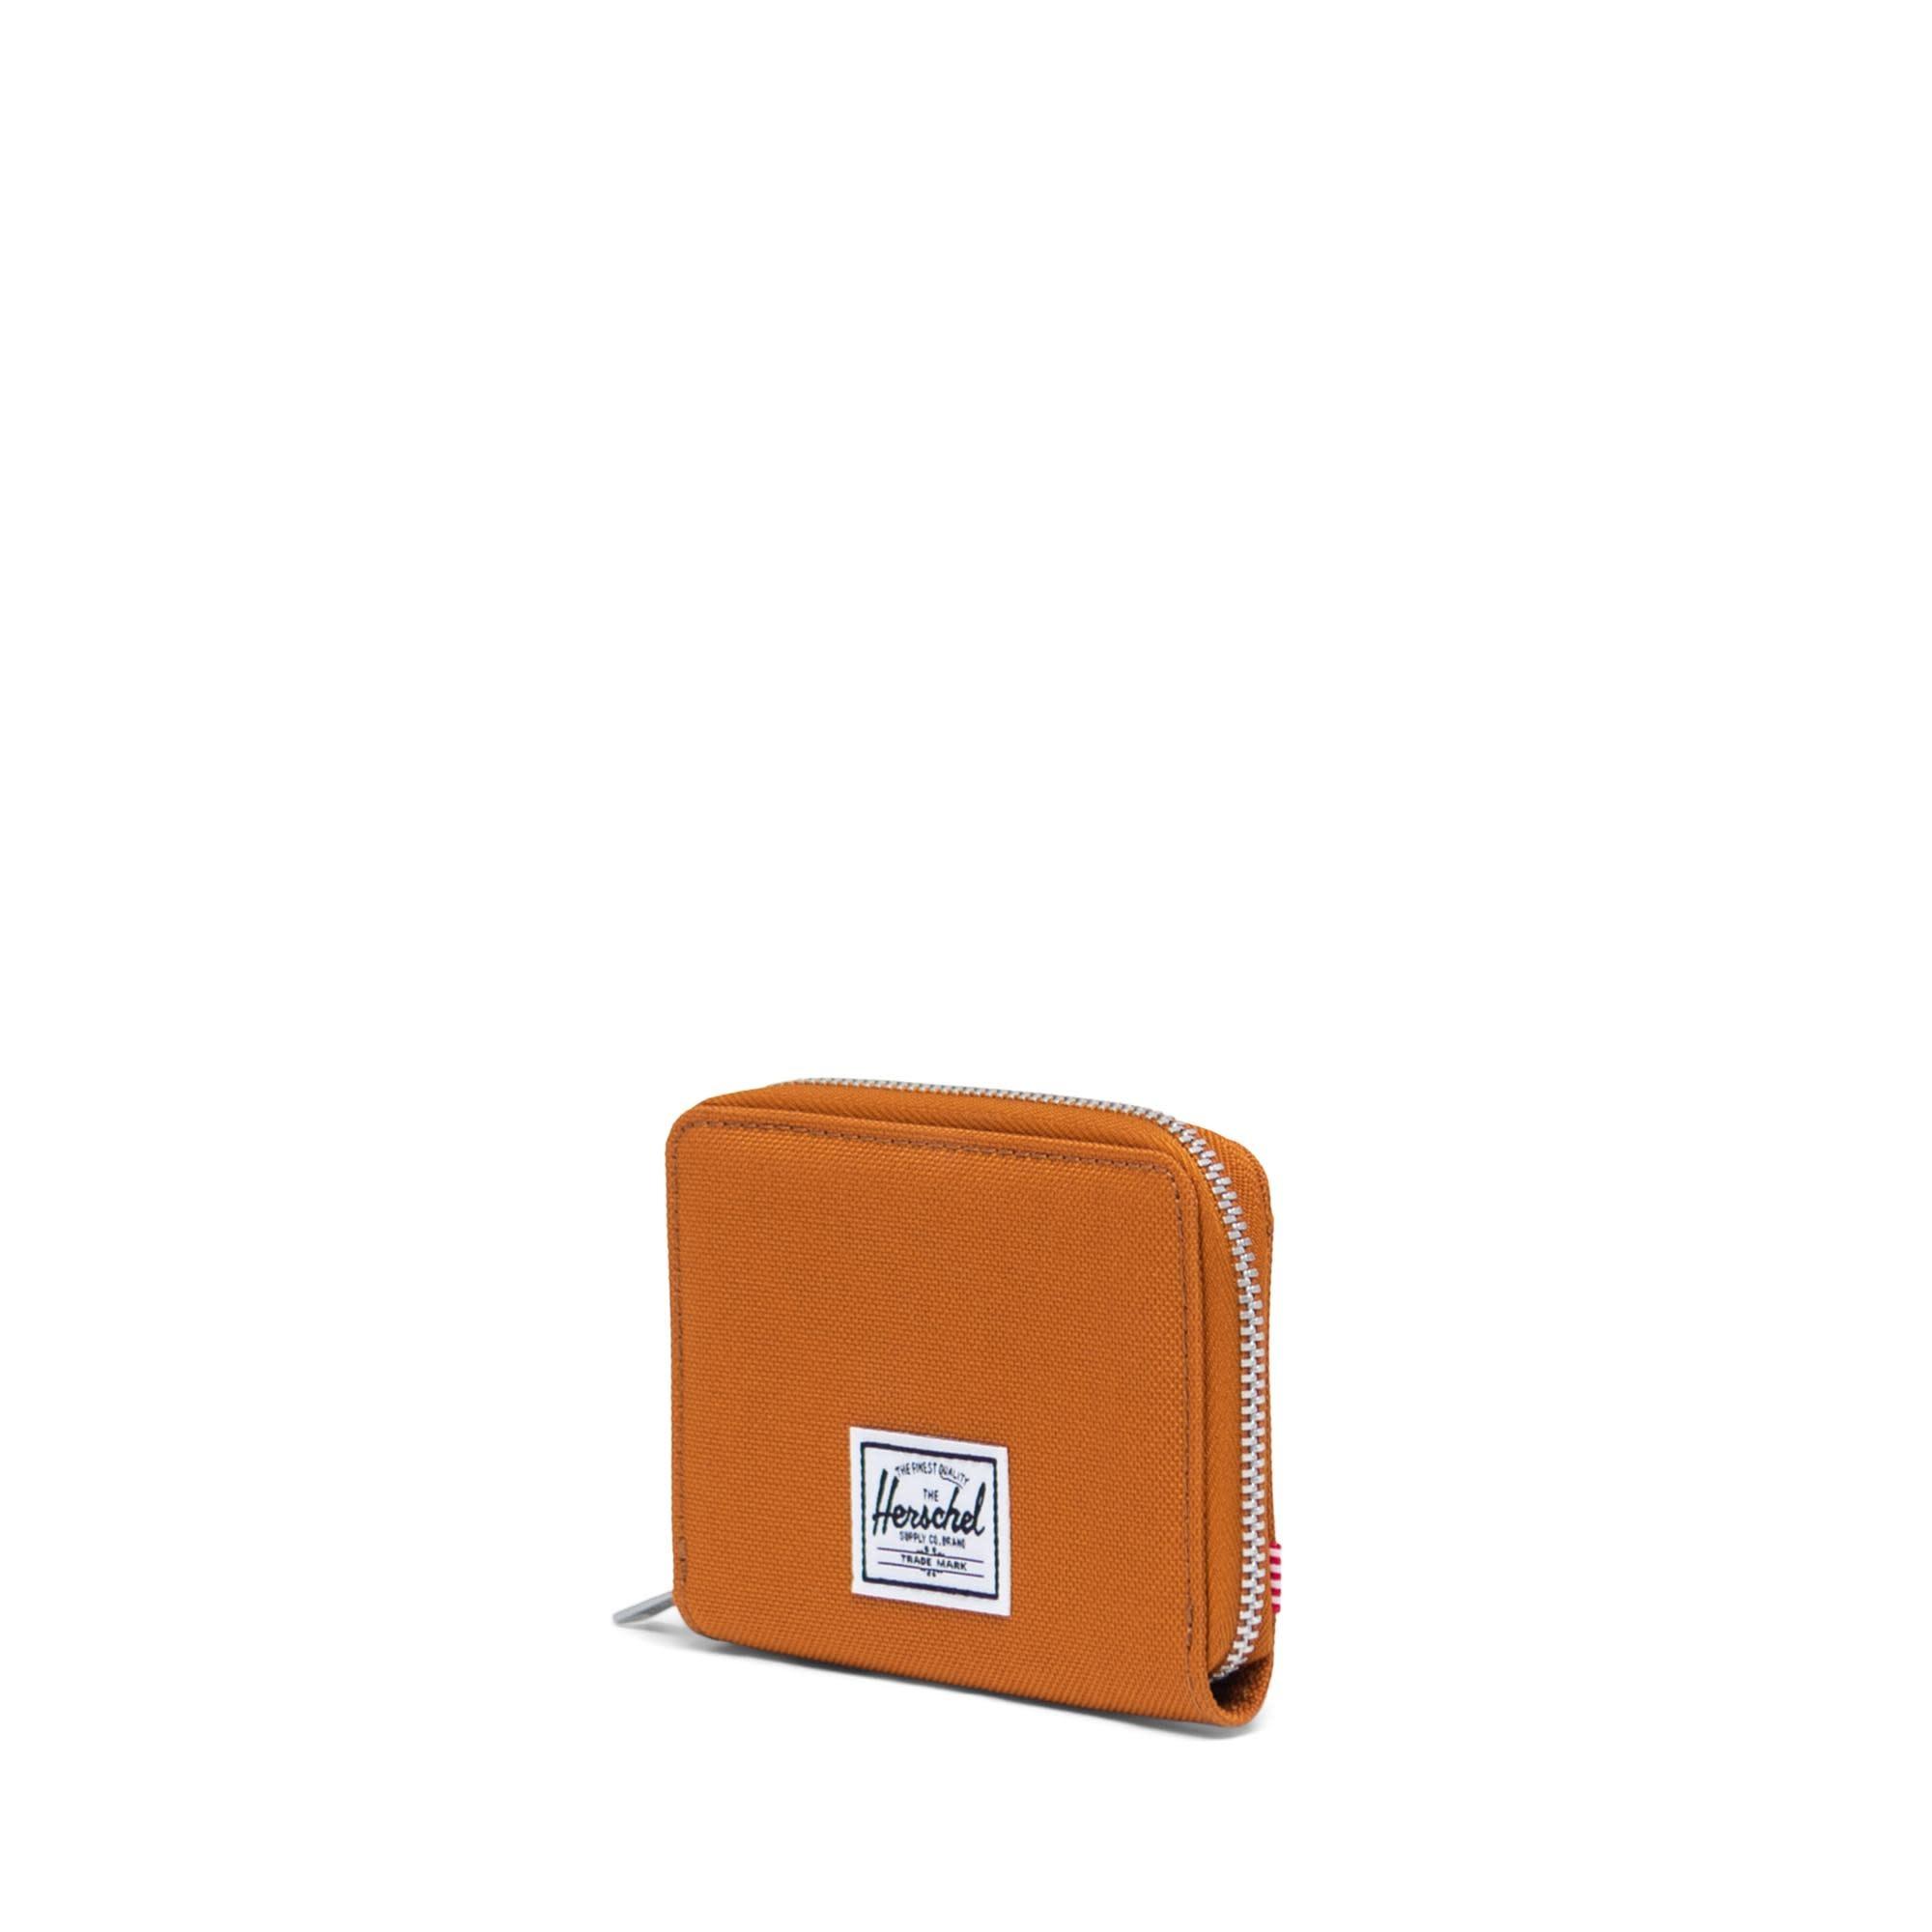 Herschel Supply Co. Herschel Tyler Wallet - Pumpkin Spice